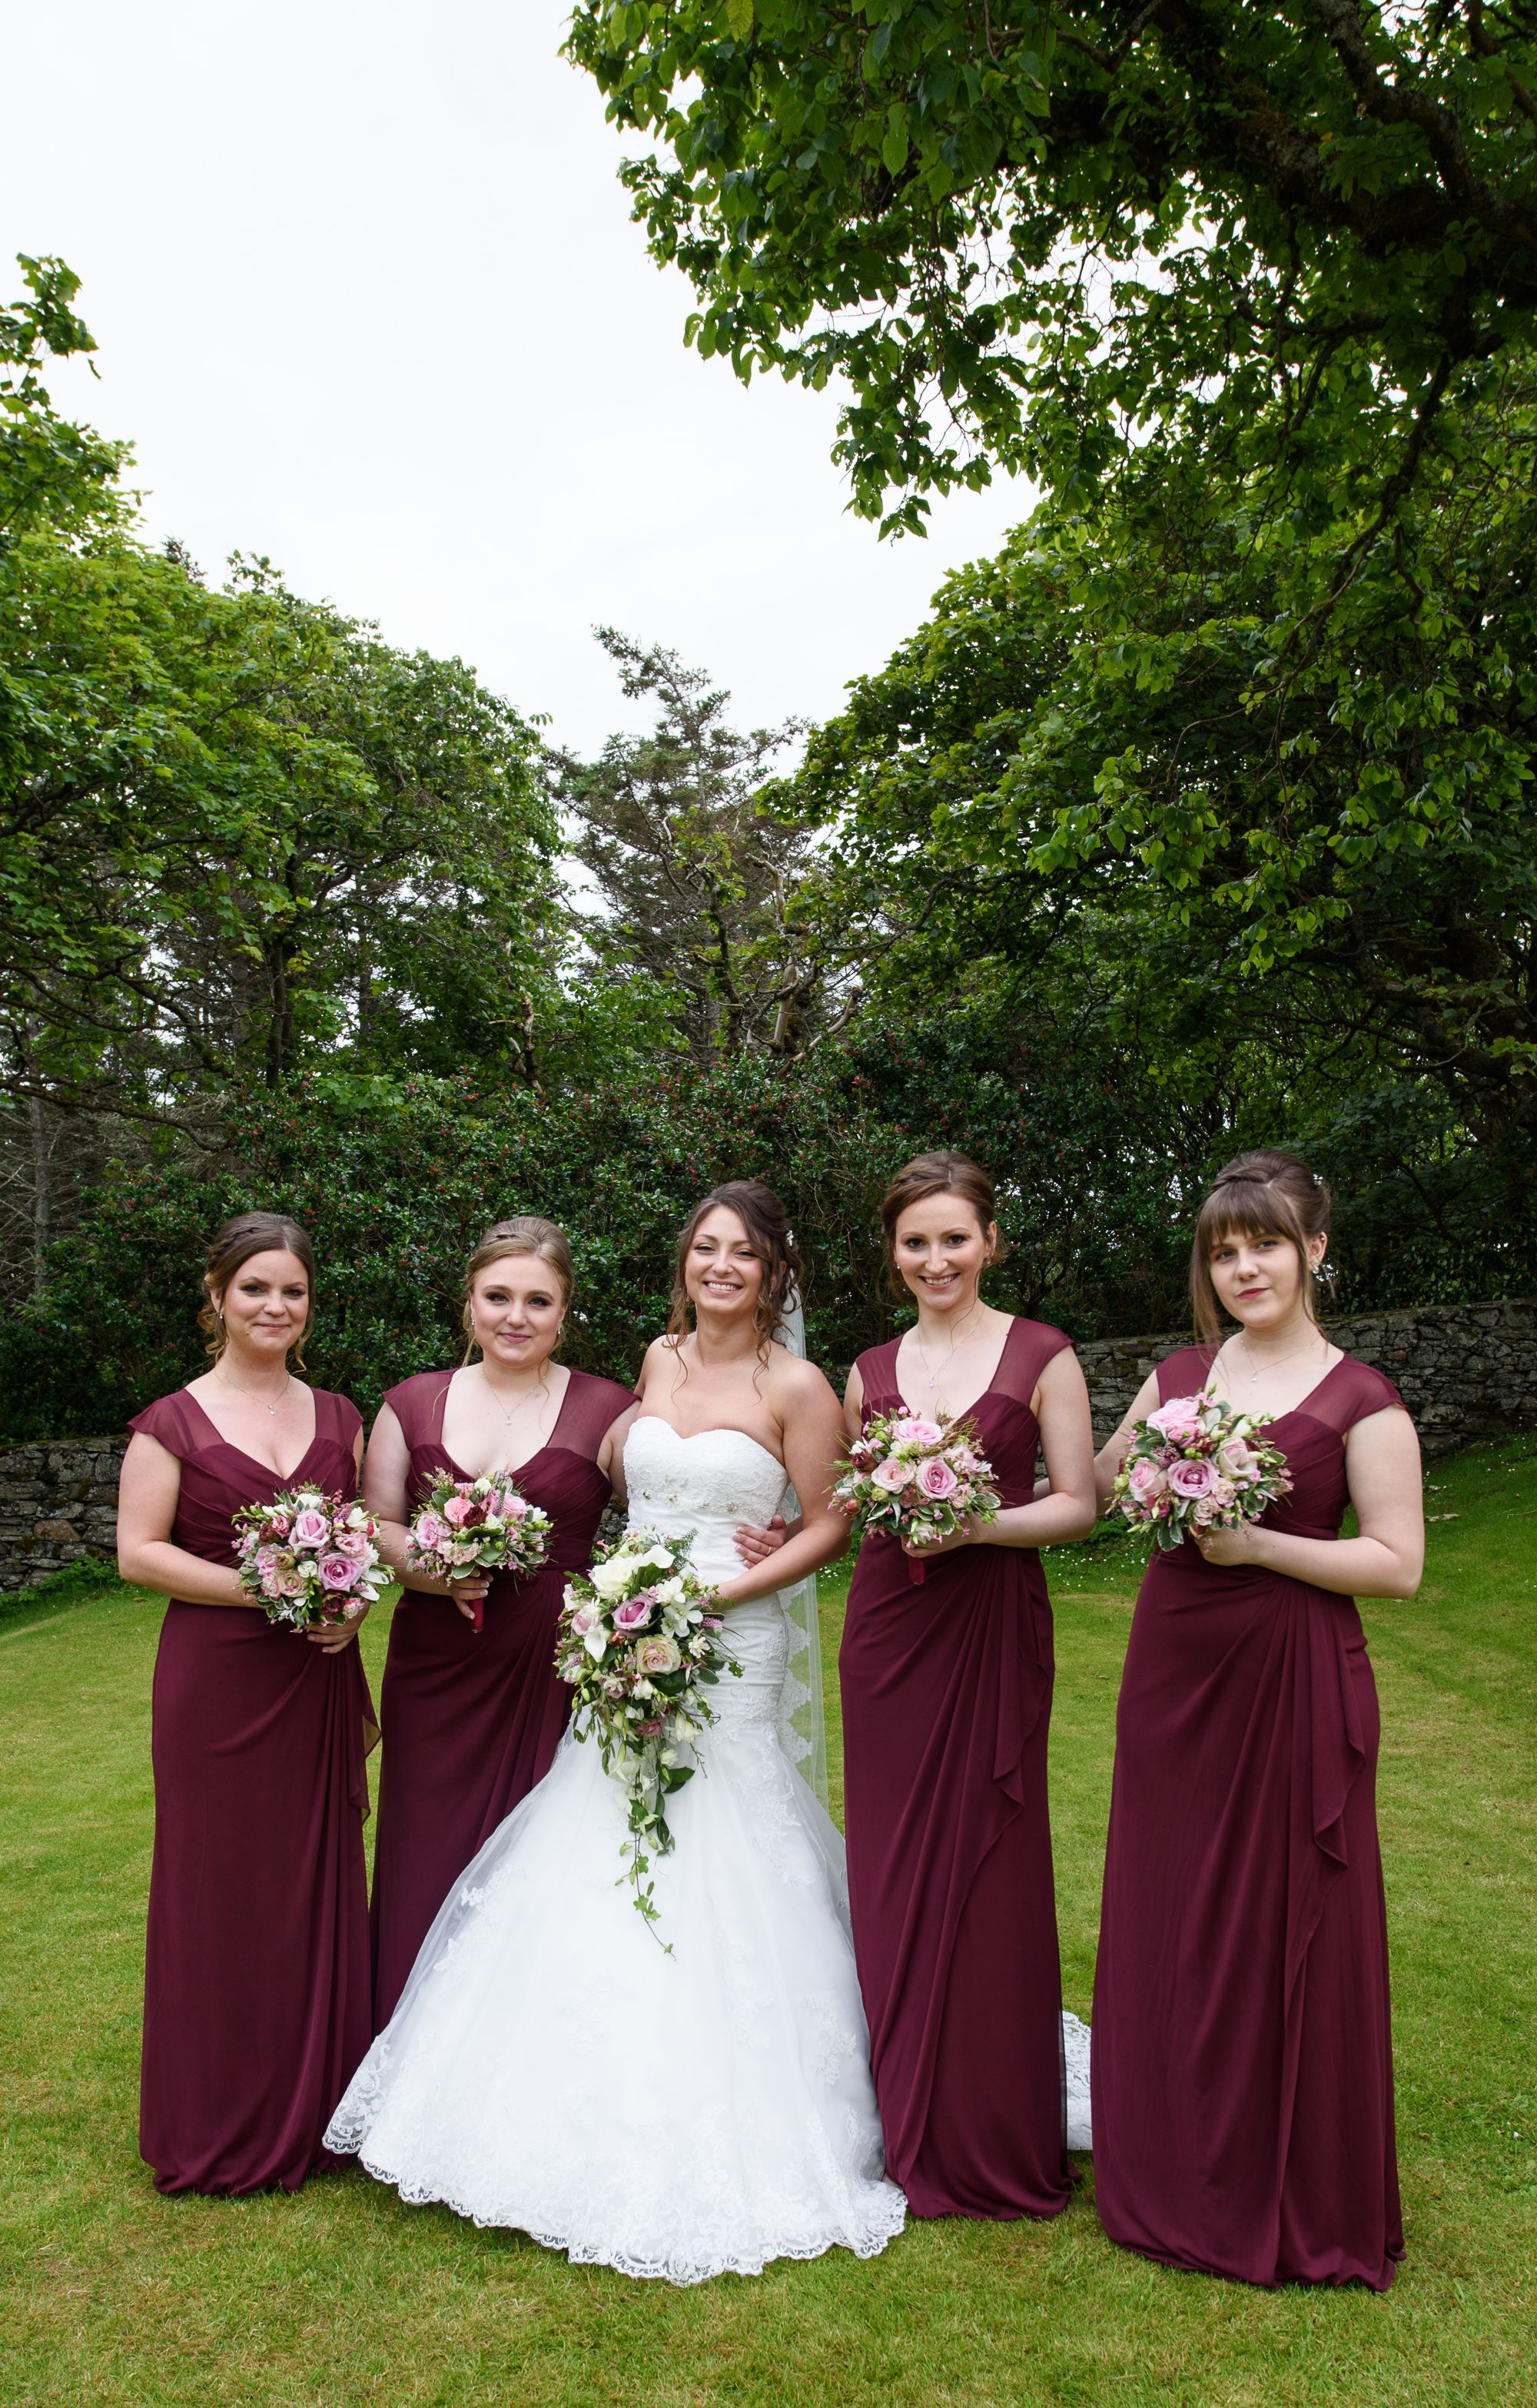 Wedding dress for body type quiz  outdoor wedding garden wedding plum bridesmaid dresses wine